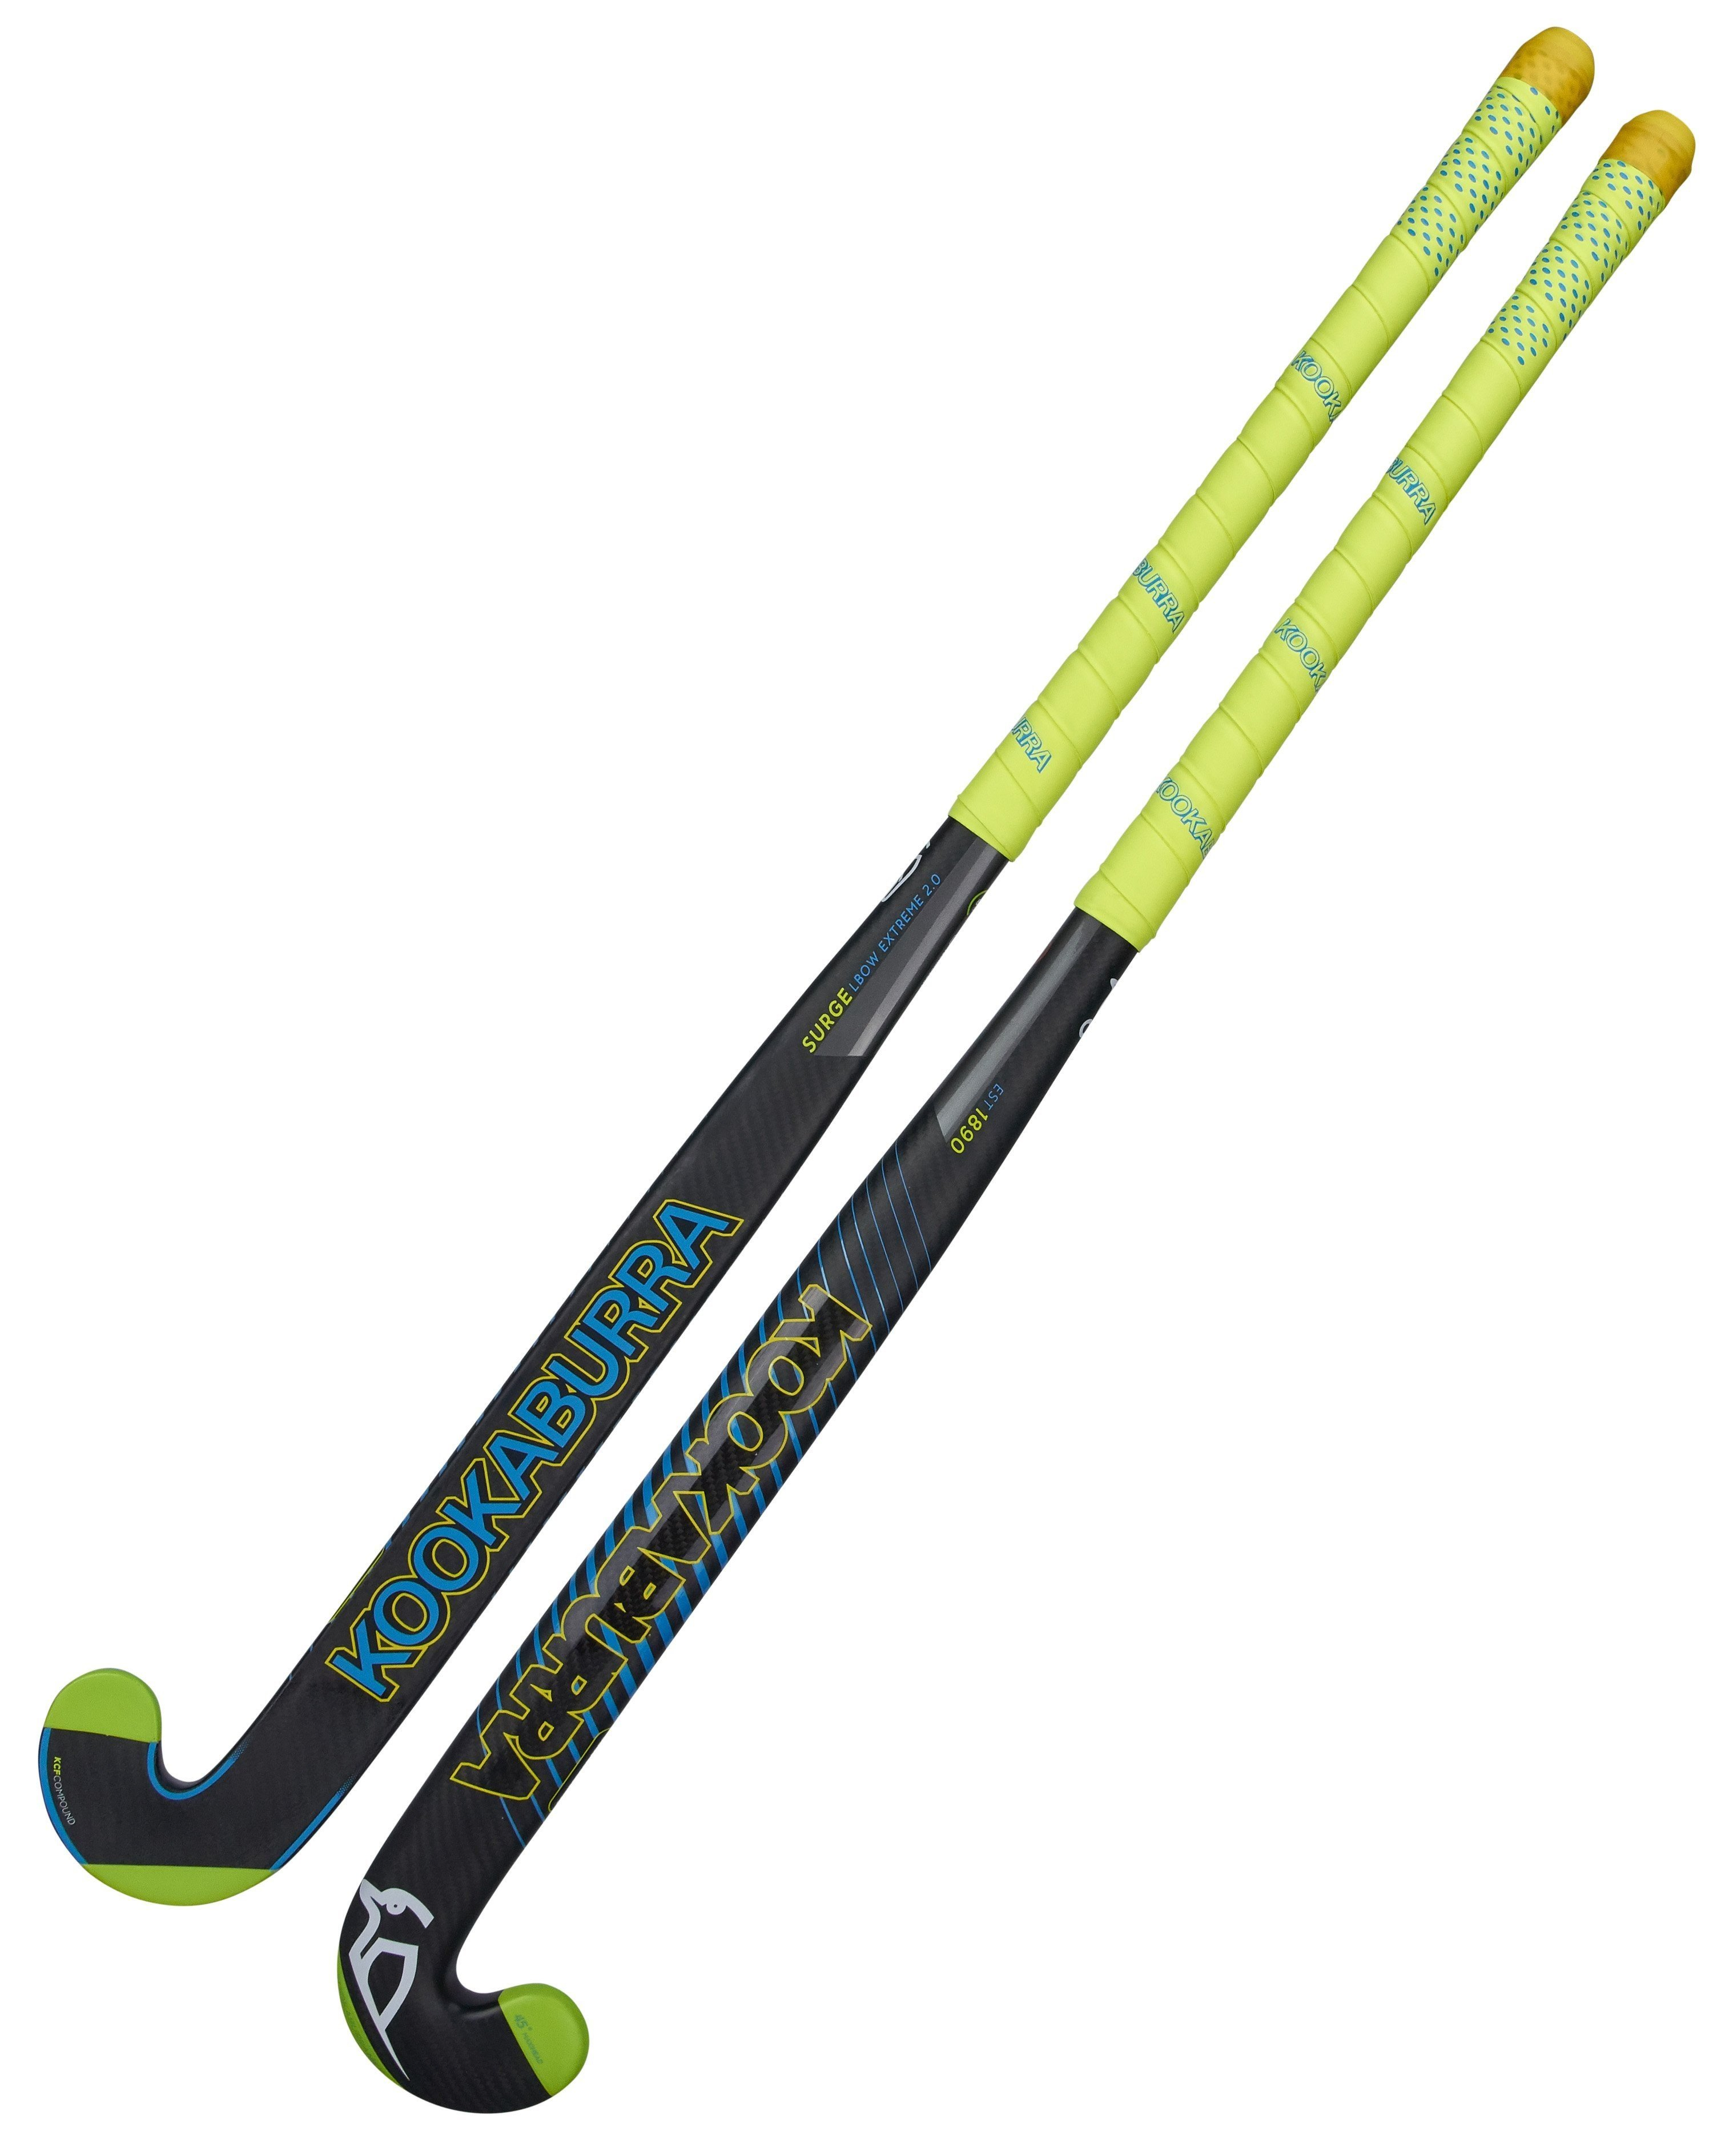 2017/18 Kookaburra Surge - Lbow Extreme 2.0 Hockey Stick